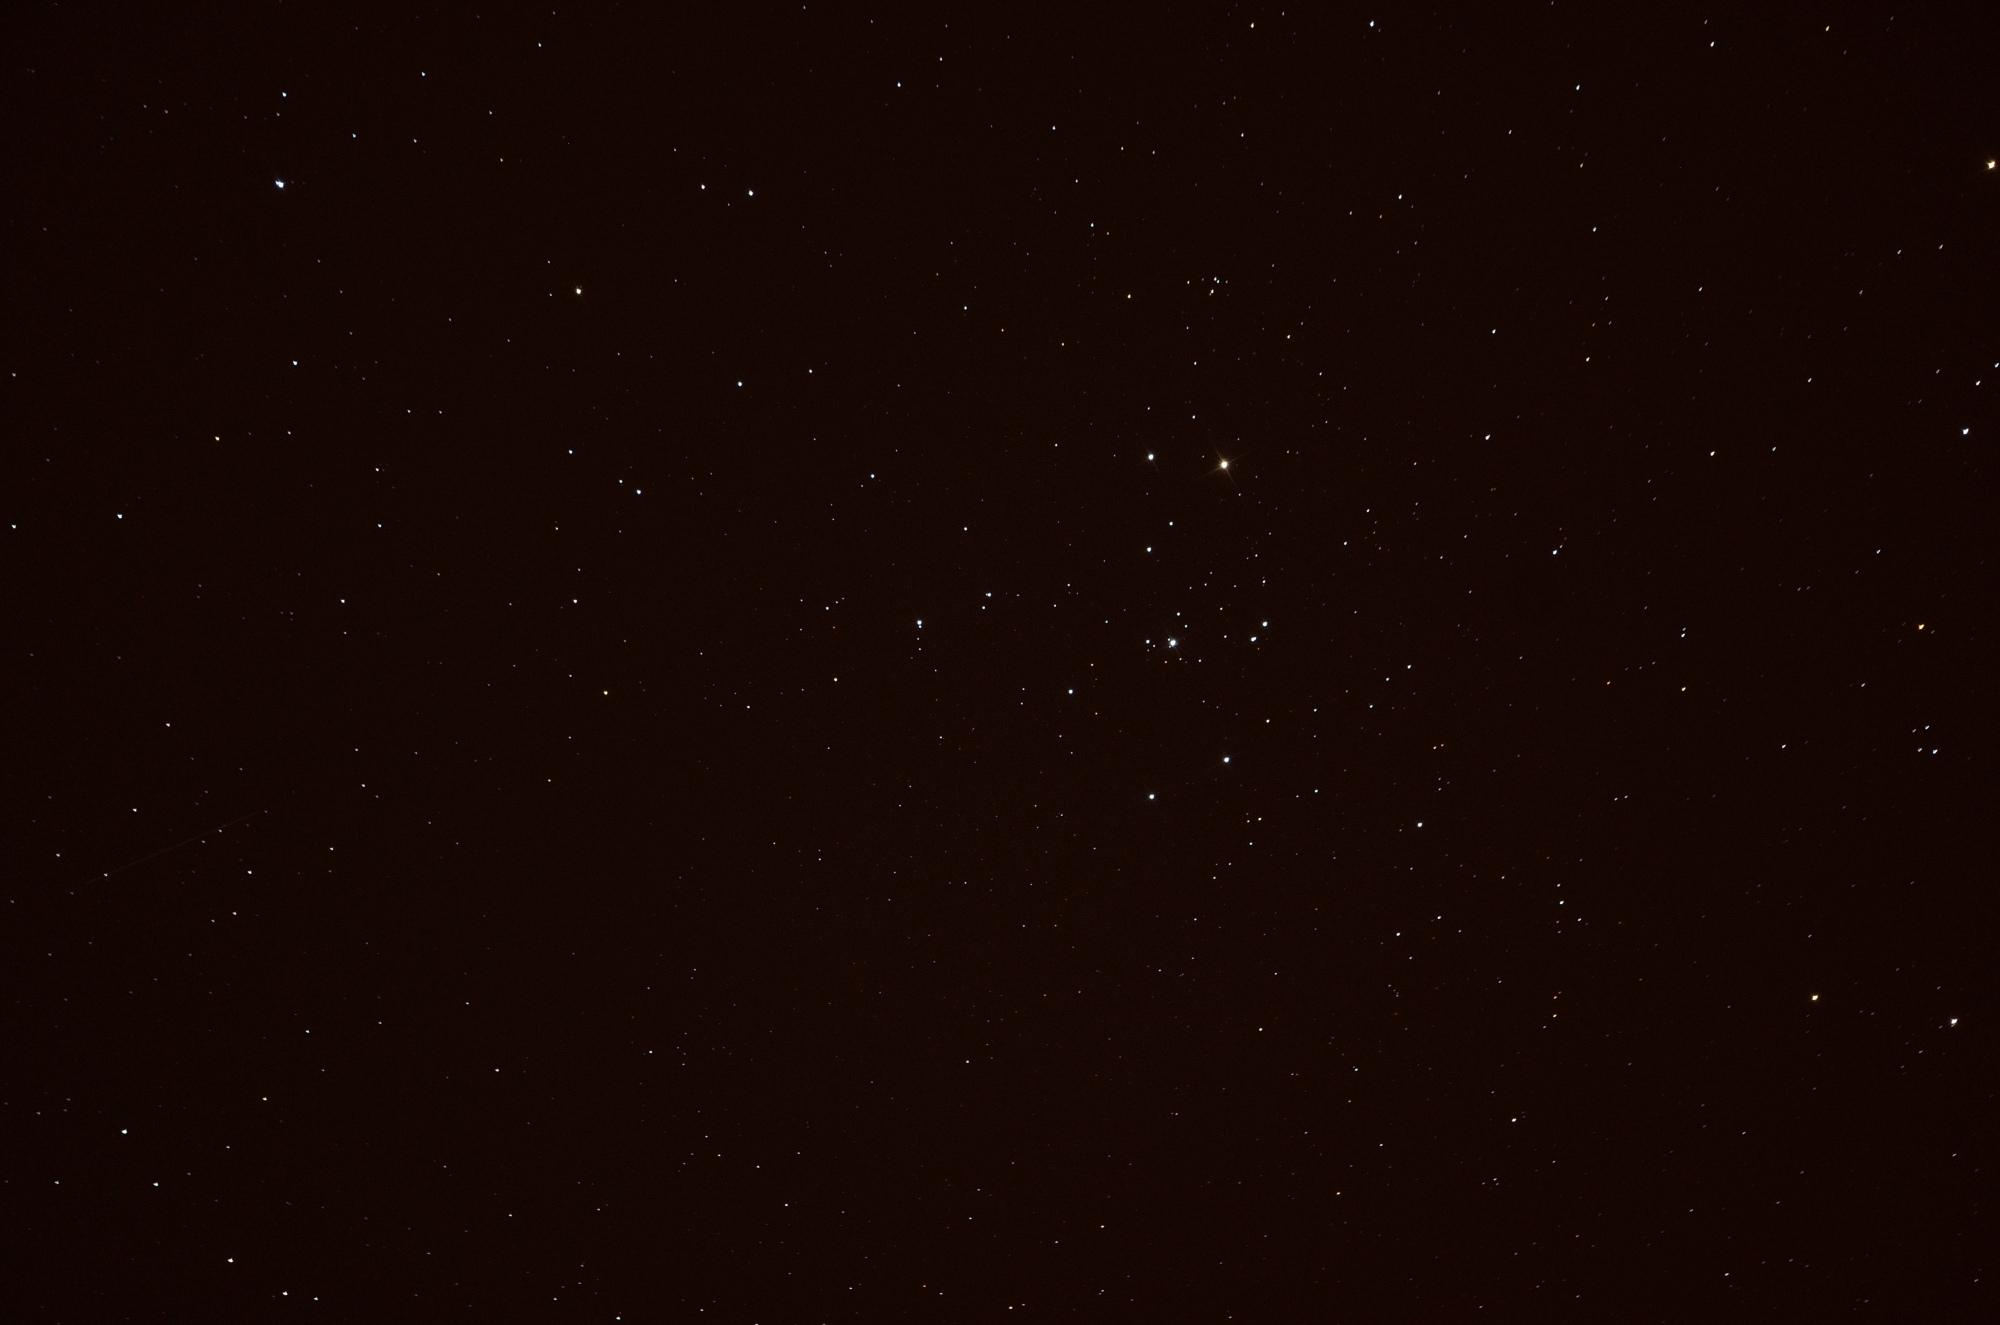 5e5a2d5013772_NGC2244.thumb.jpg.95b263c30189aebb1b6ca34cb65e64fc.jpg